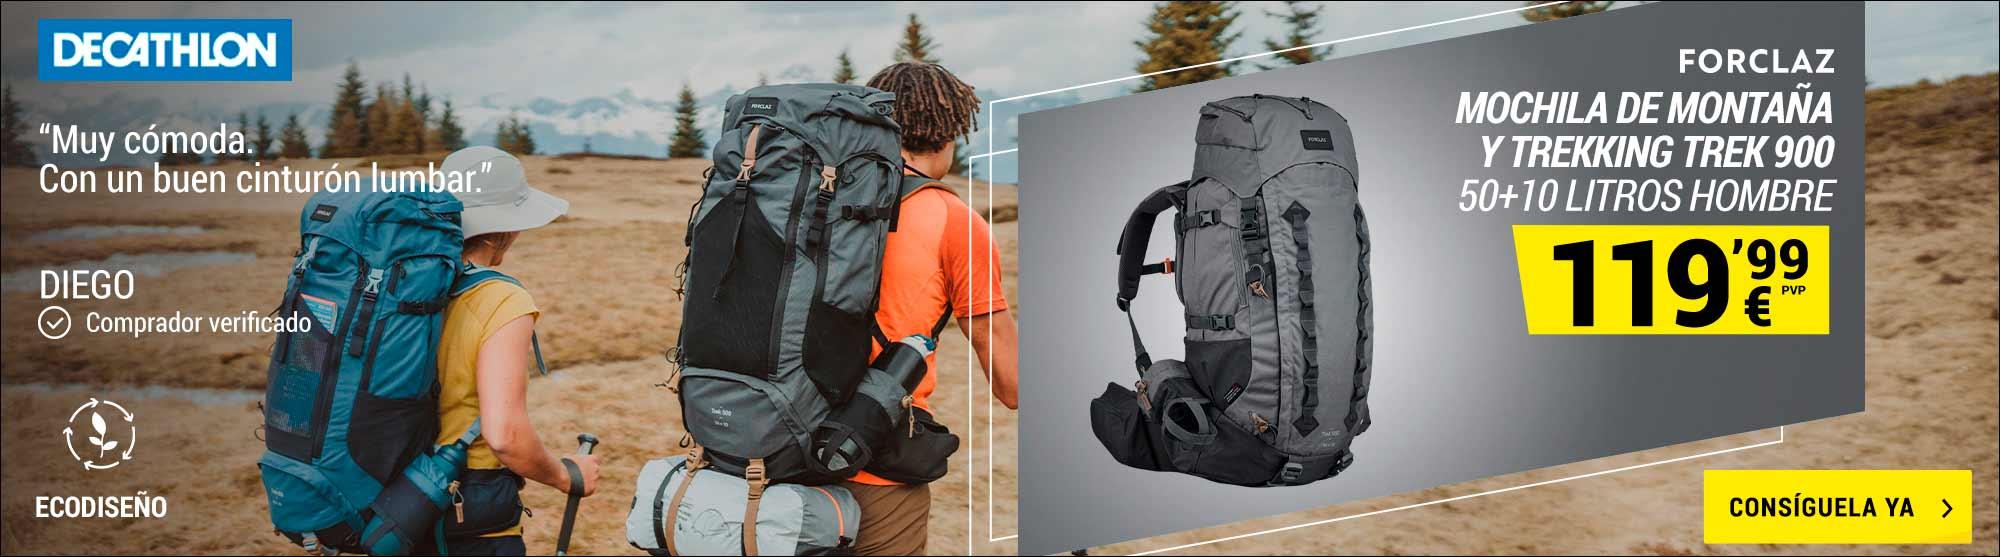 Mochila de Montaña y Trekking Decathlon Forclaz, Trek900 Symbium 50+10Litros